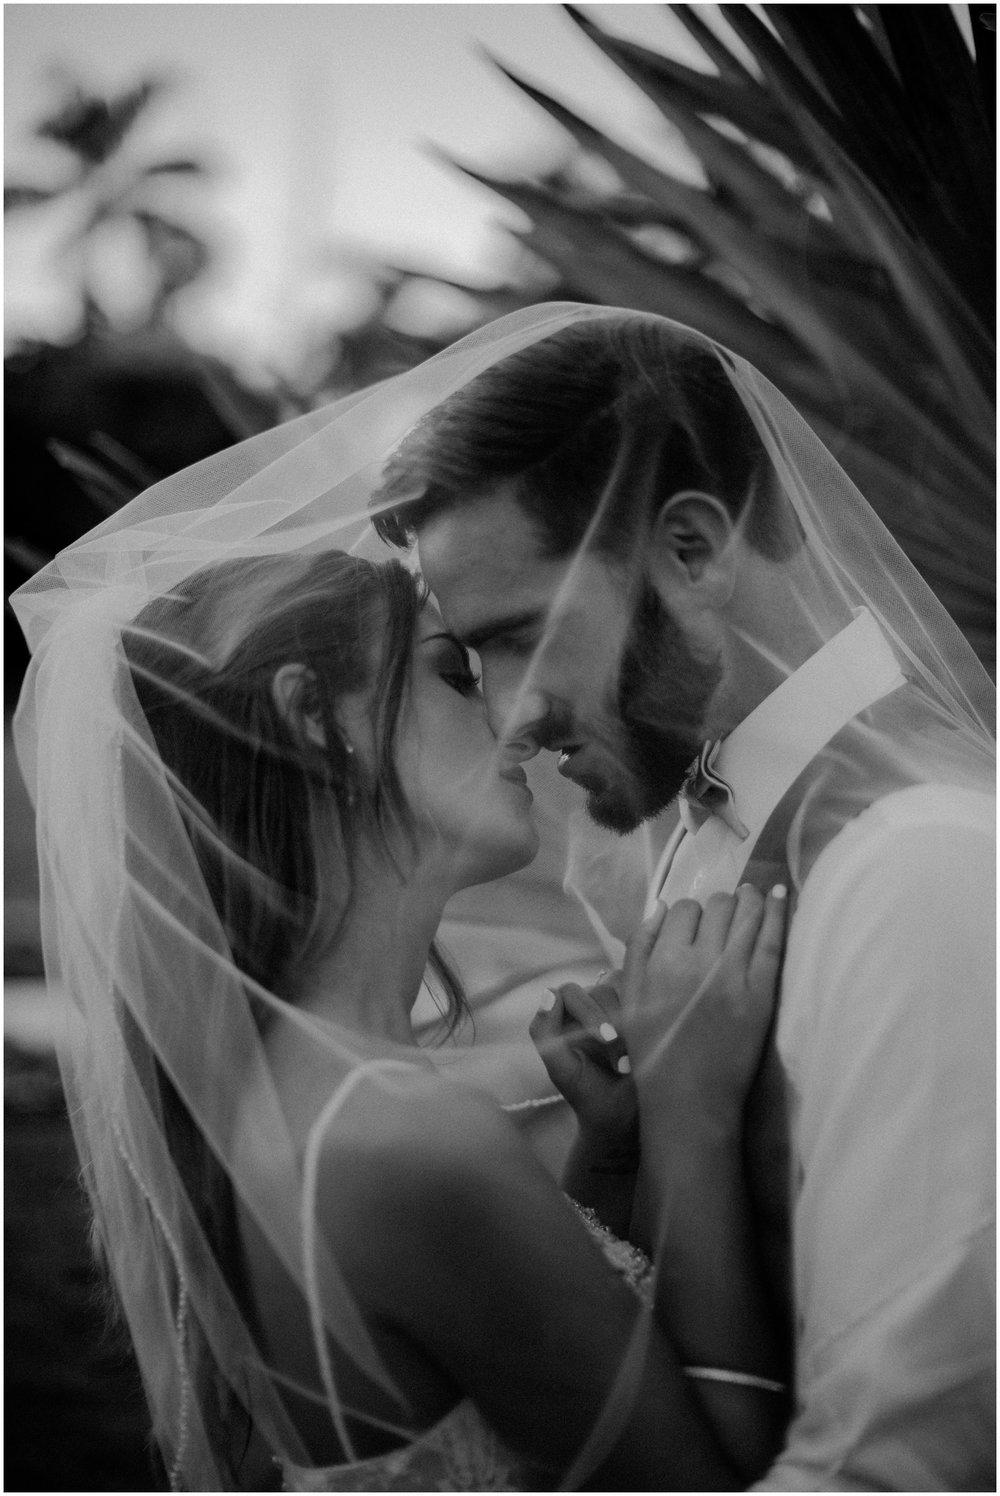 milwaukee-wedding-photographer-hyatt-ziva-rose-hall-montego-bay-wedding_0110.jpg